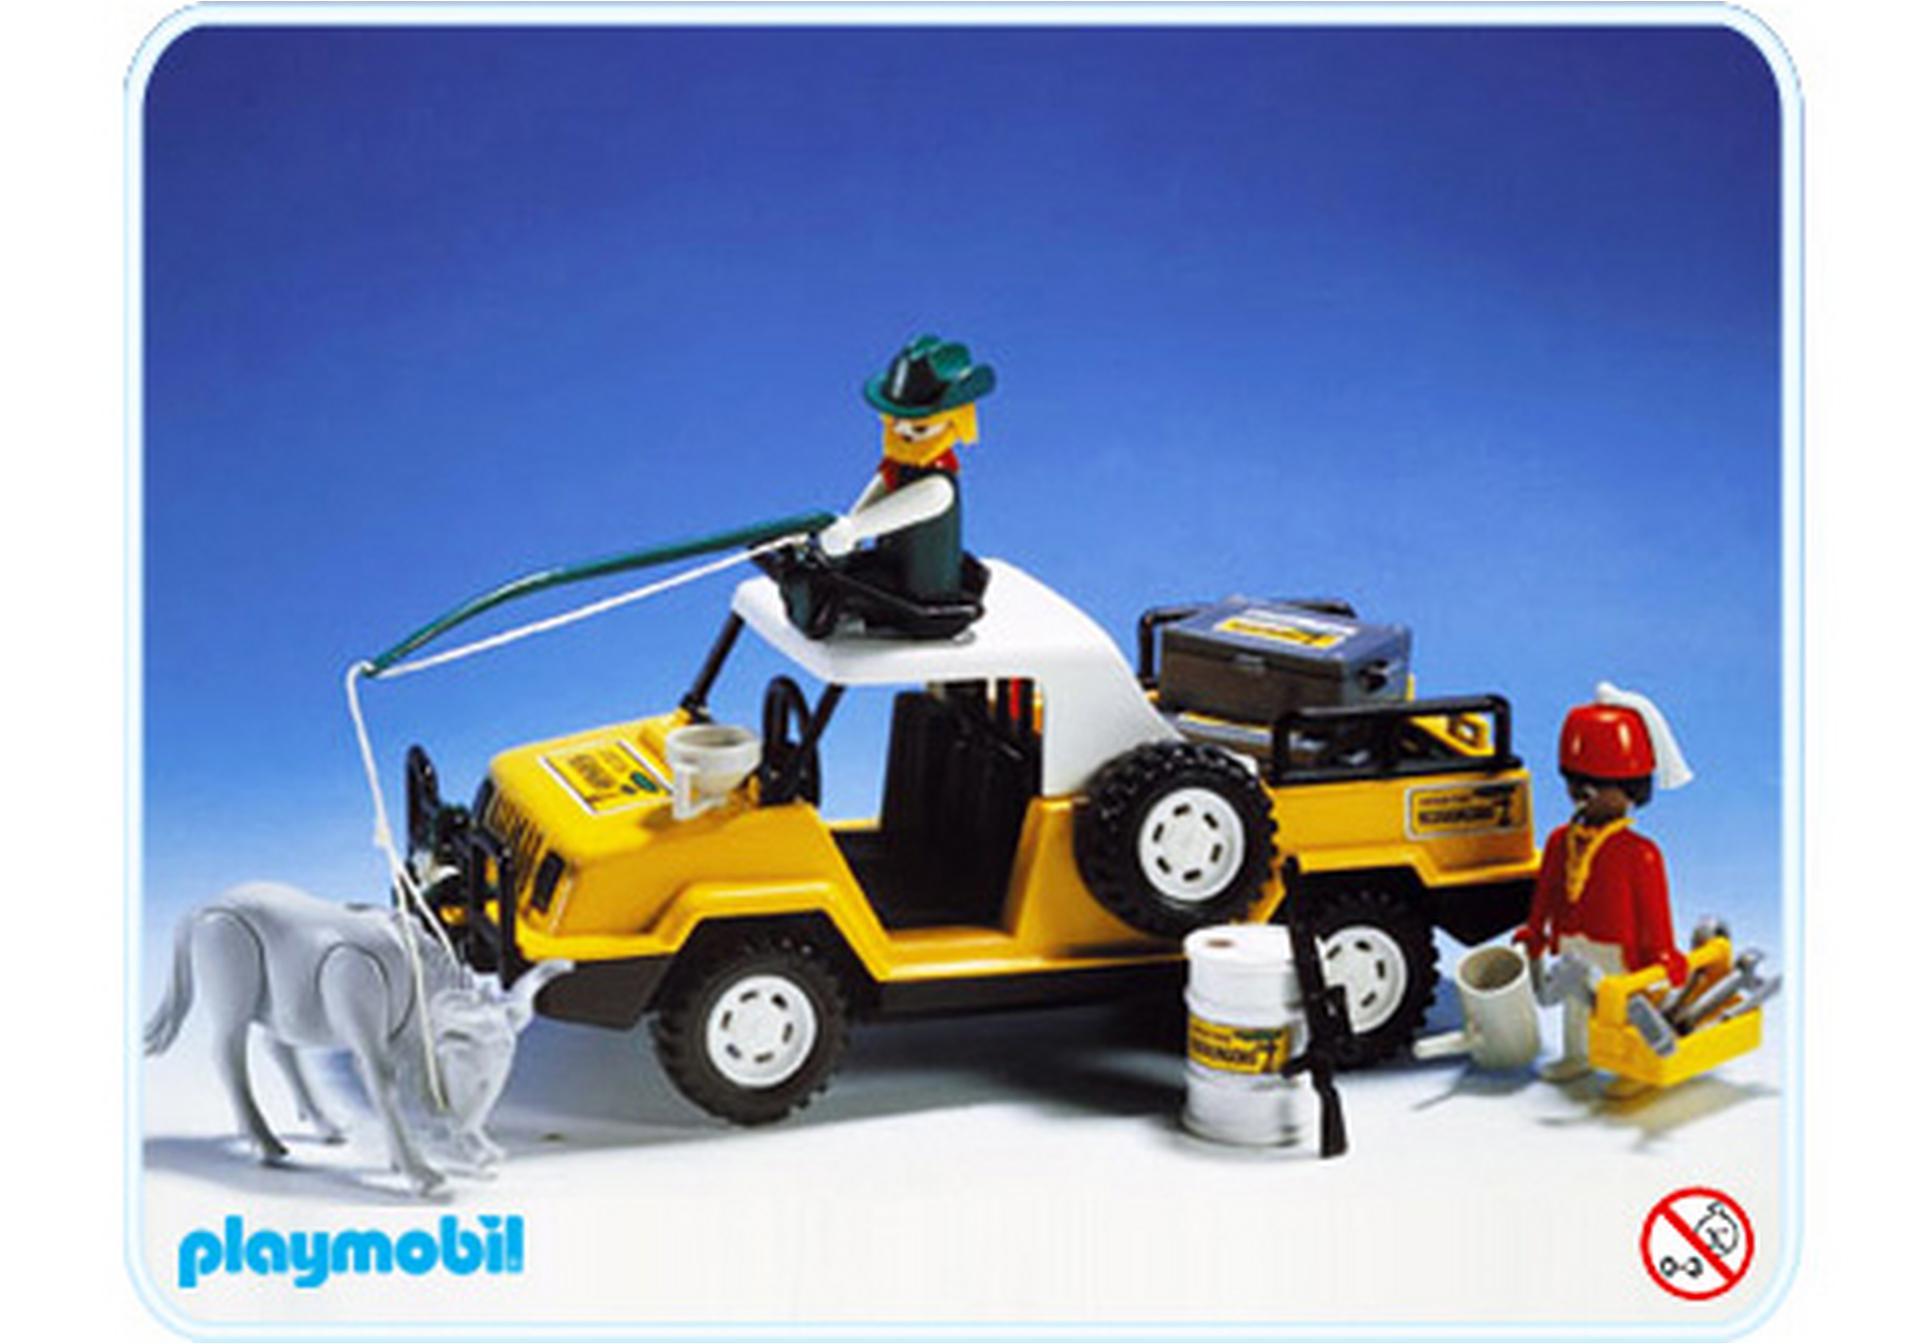 Safari auto 3528 a playmobil deutschland for Jugendzimmer playmobil